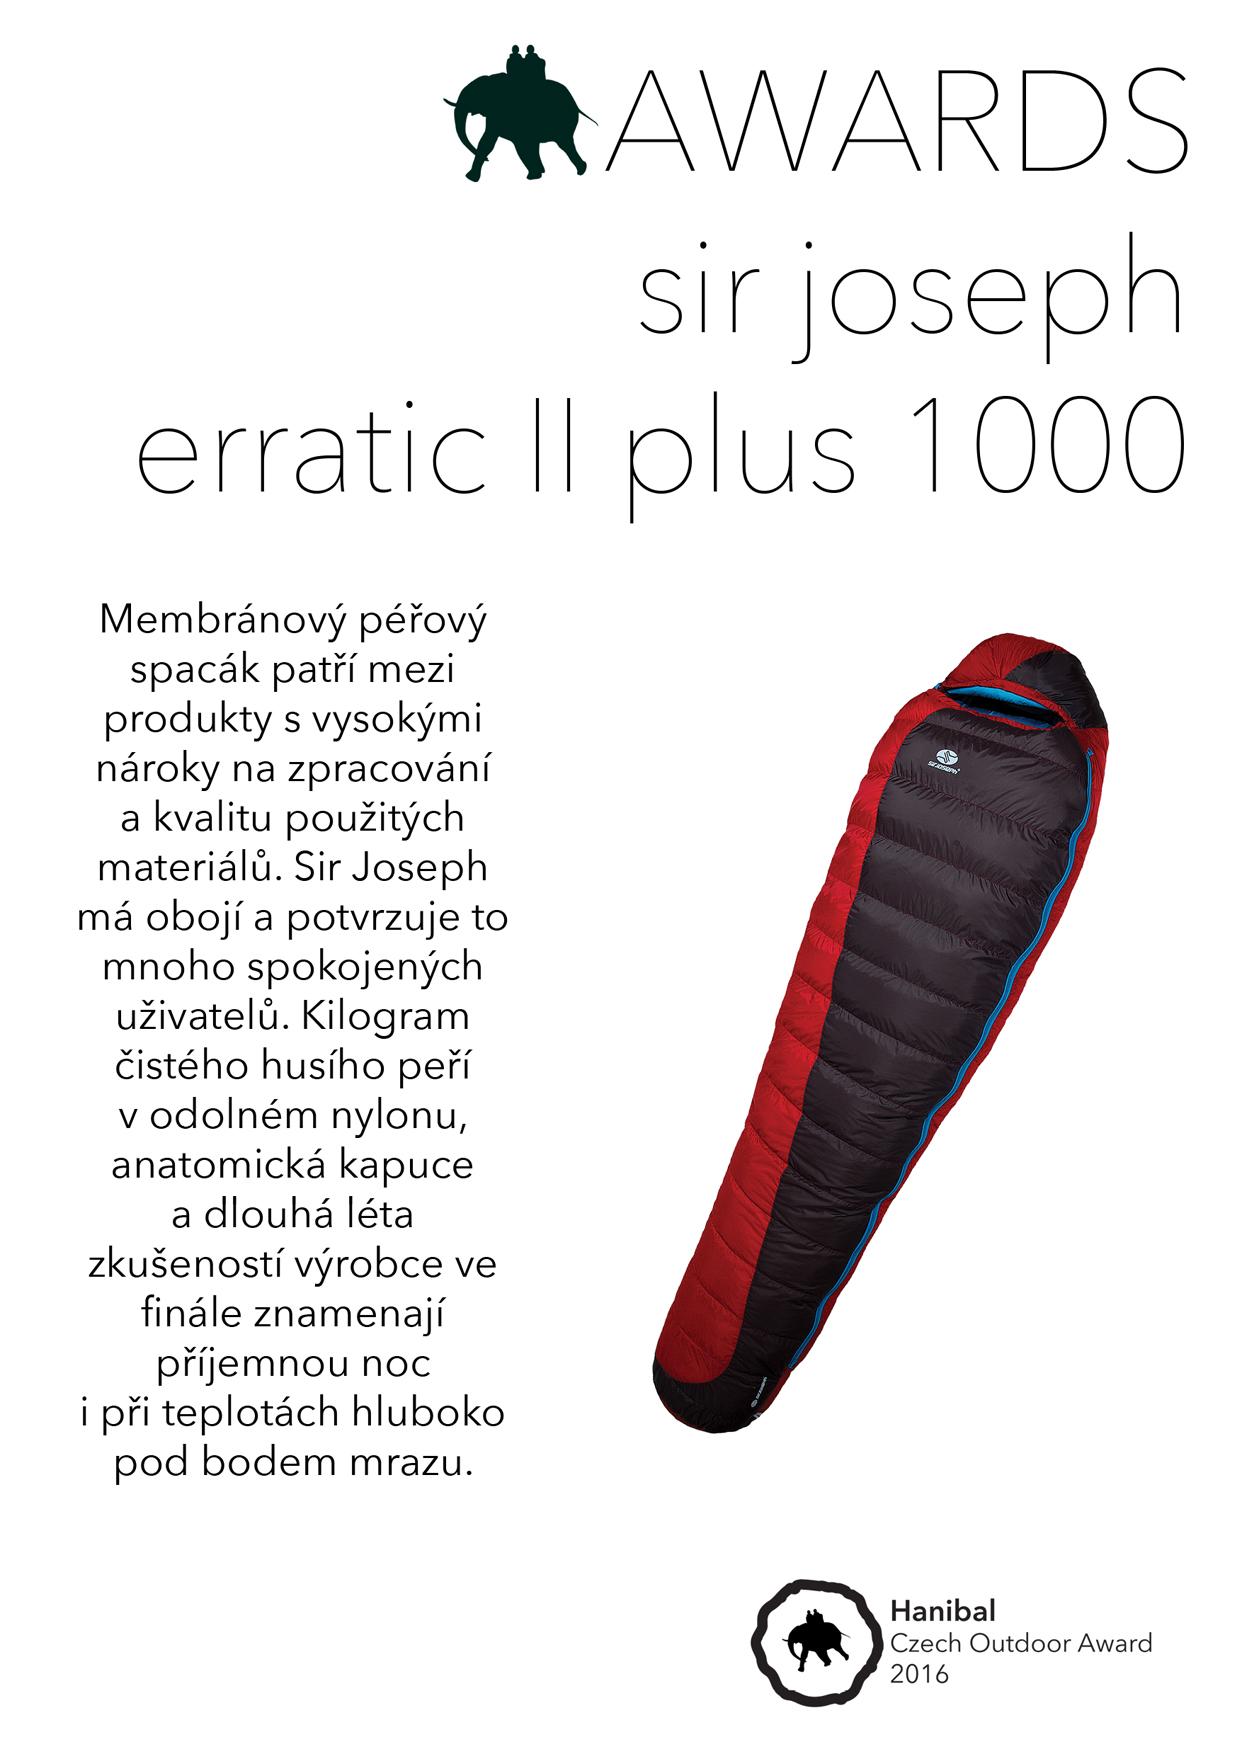 Sir Joseph